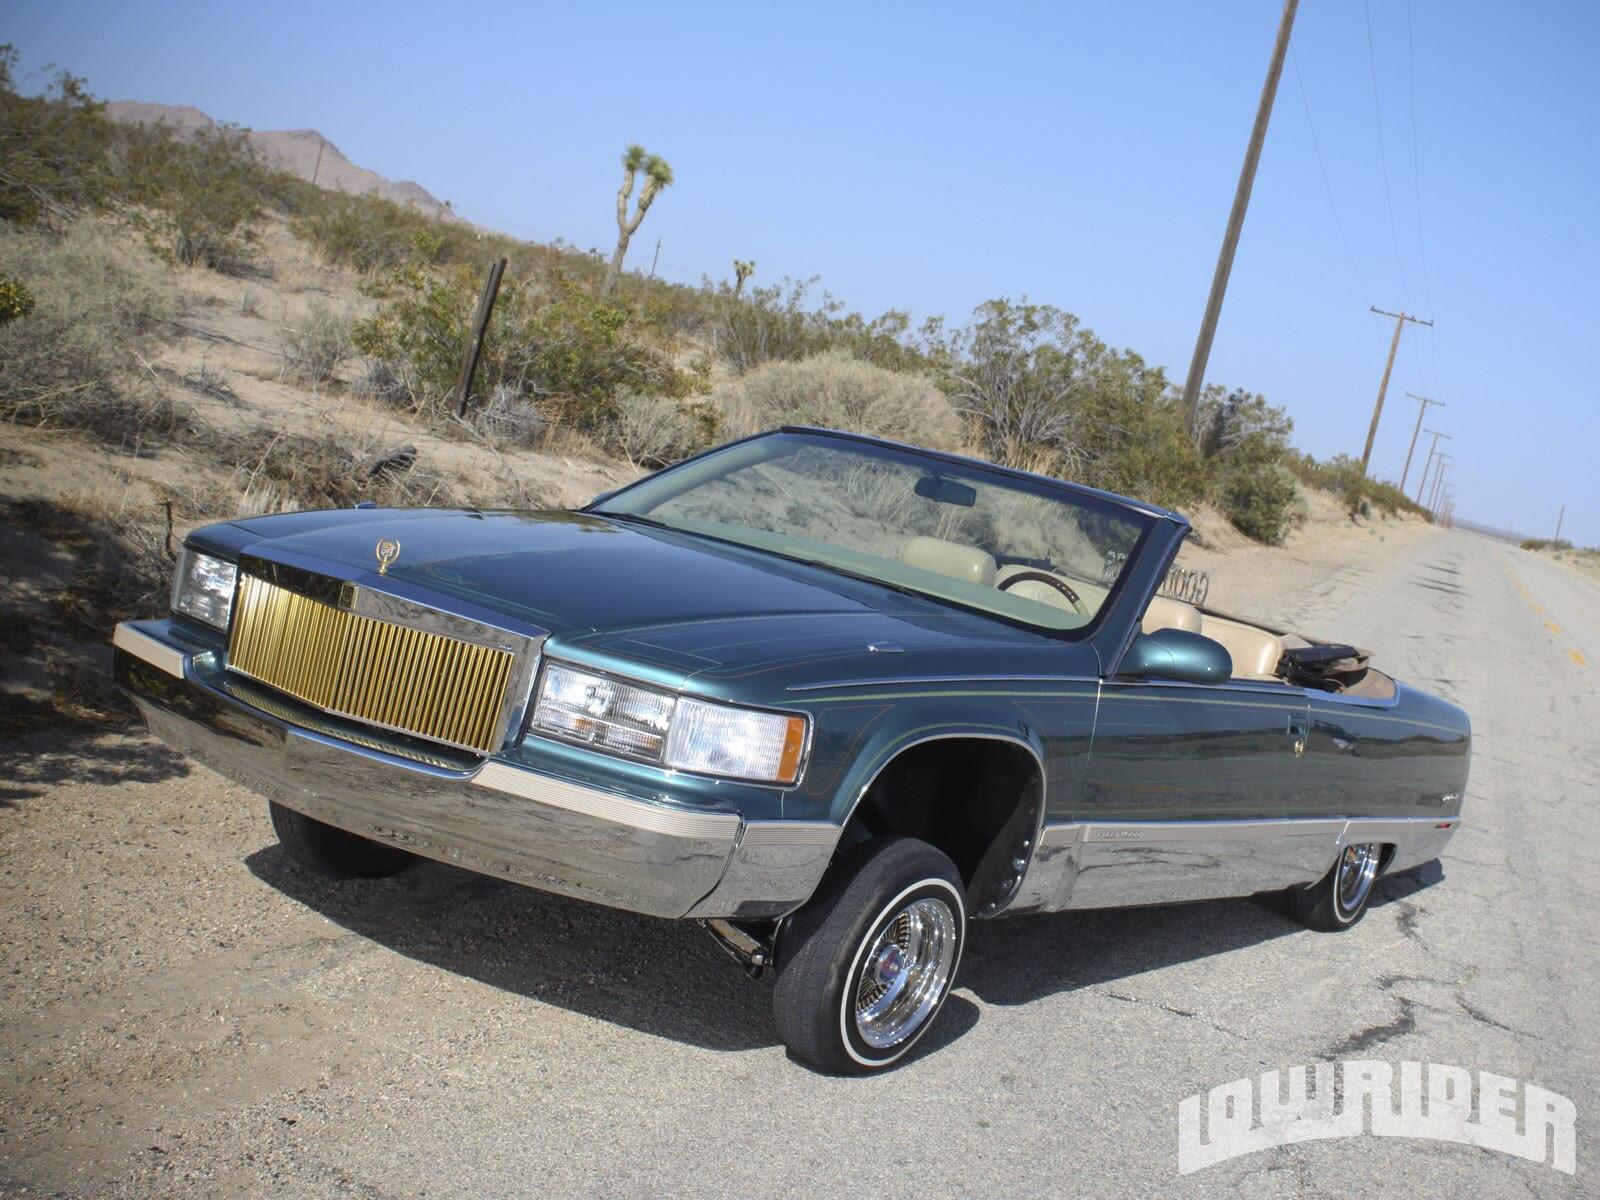 1994 Cadillac Fleetwood Convertible - Lowrider Magazine